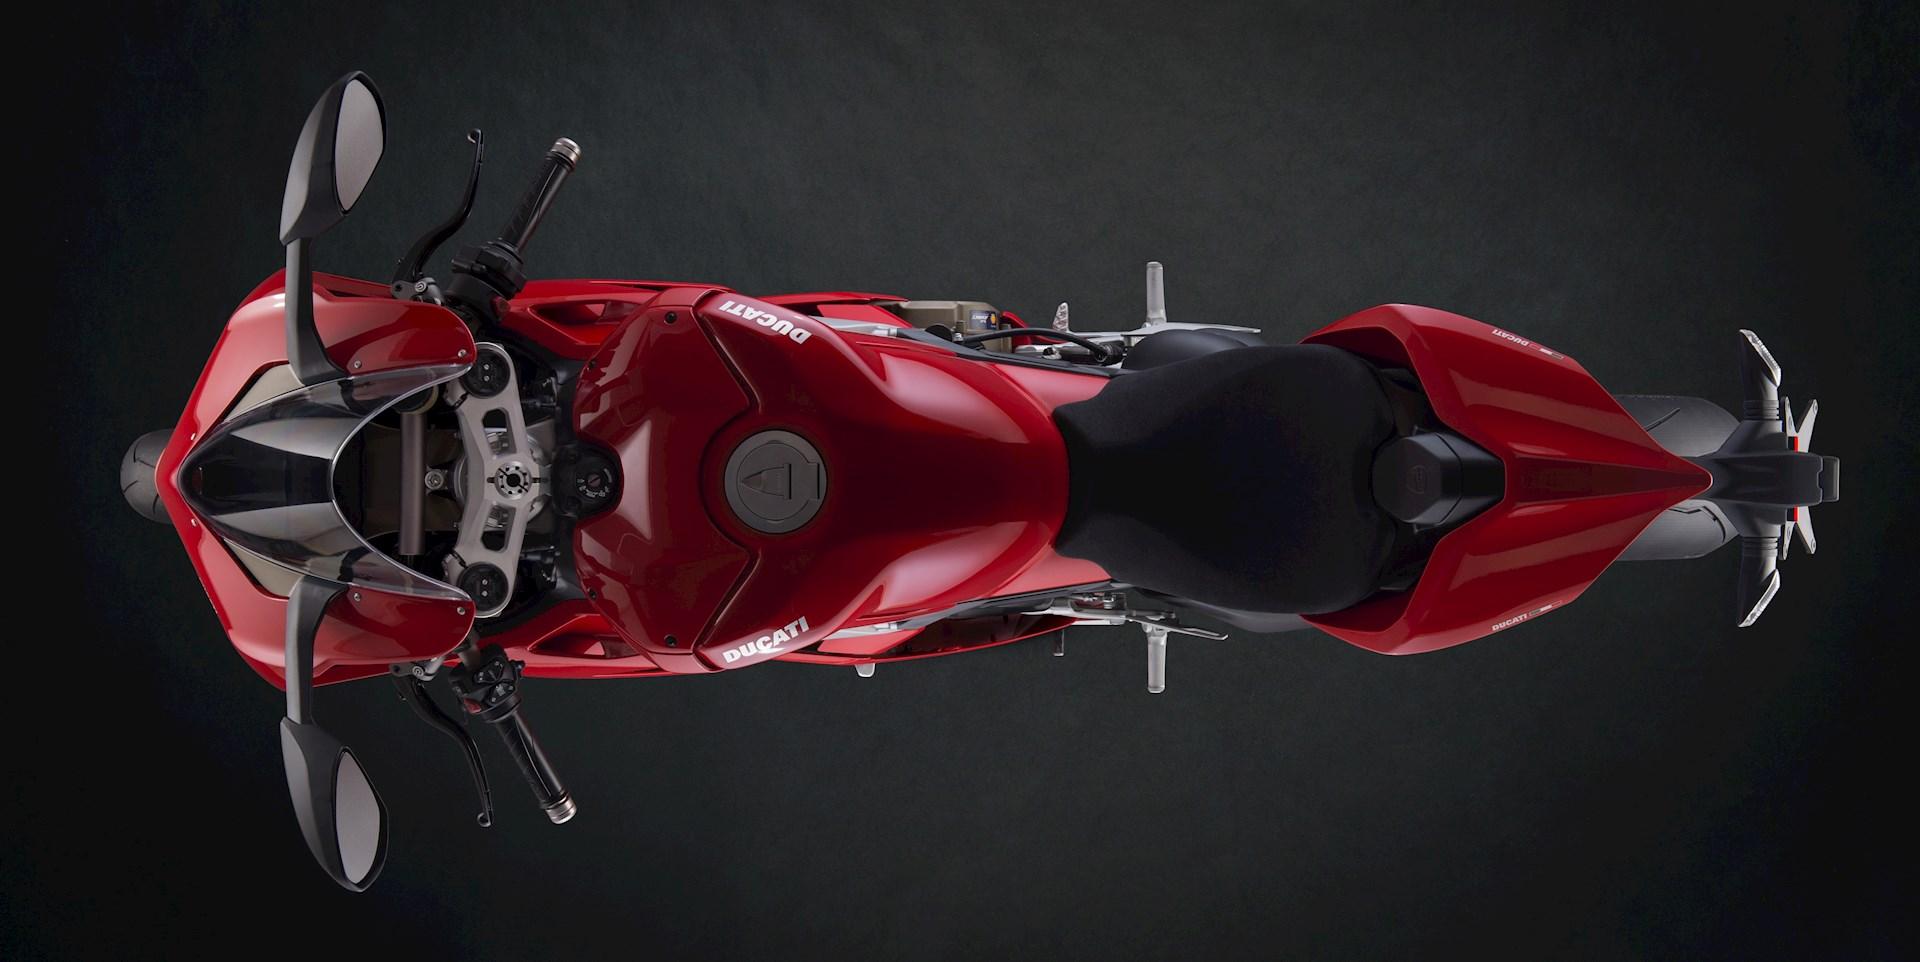 МОТОЦИКЛ DUCATI SUPERBIKE PANIGALE V4 S  Артмото - купить квадроцикл в украине и харькове, мотоцикл, снегоход, скутер, мопед, электромобиль